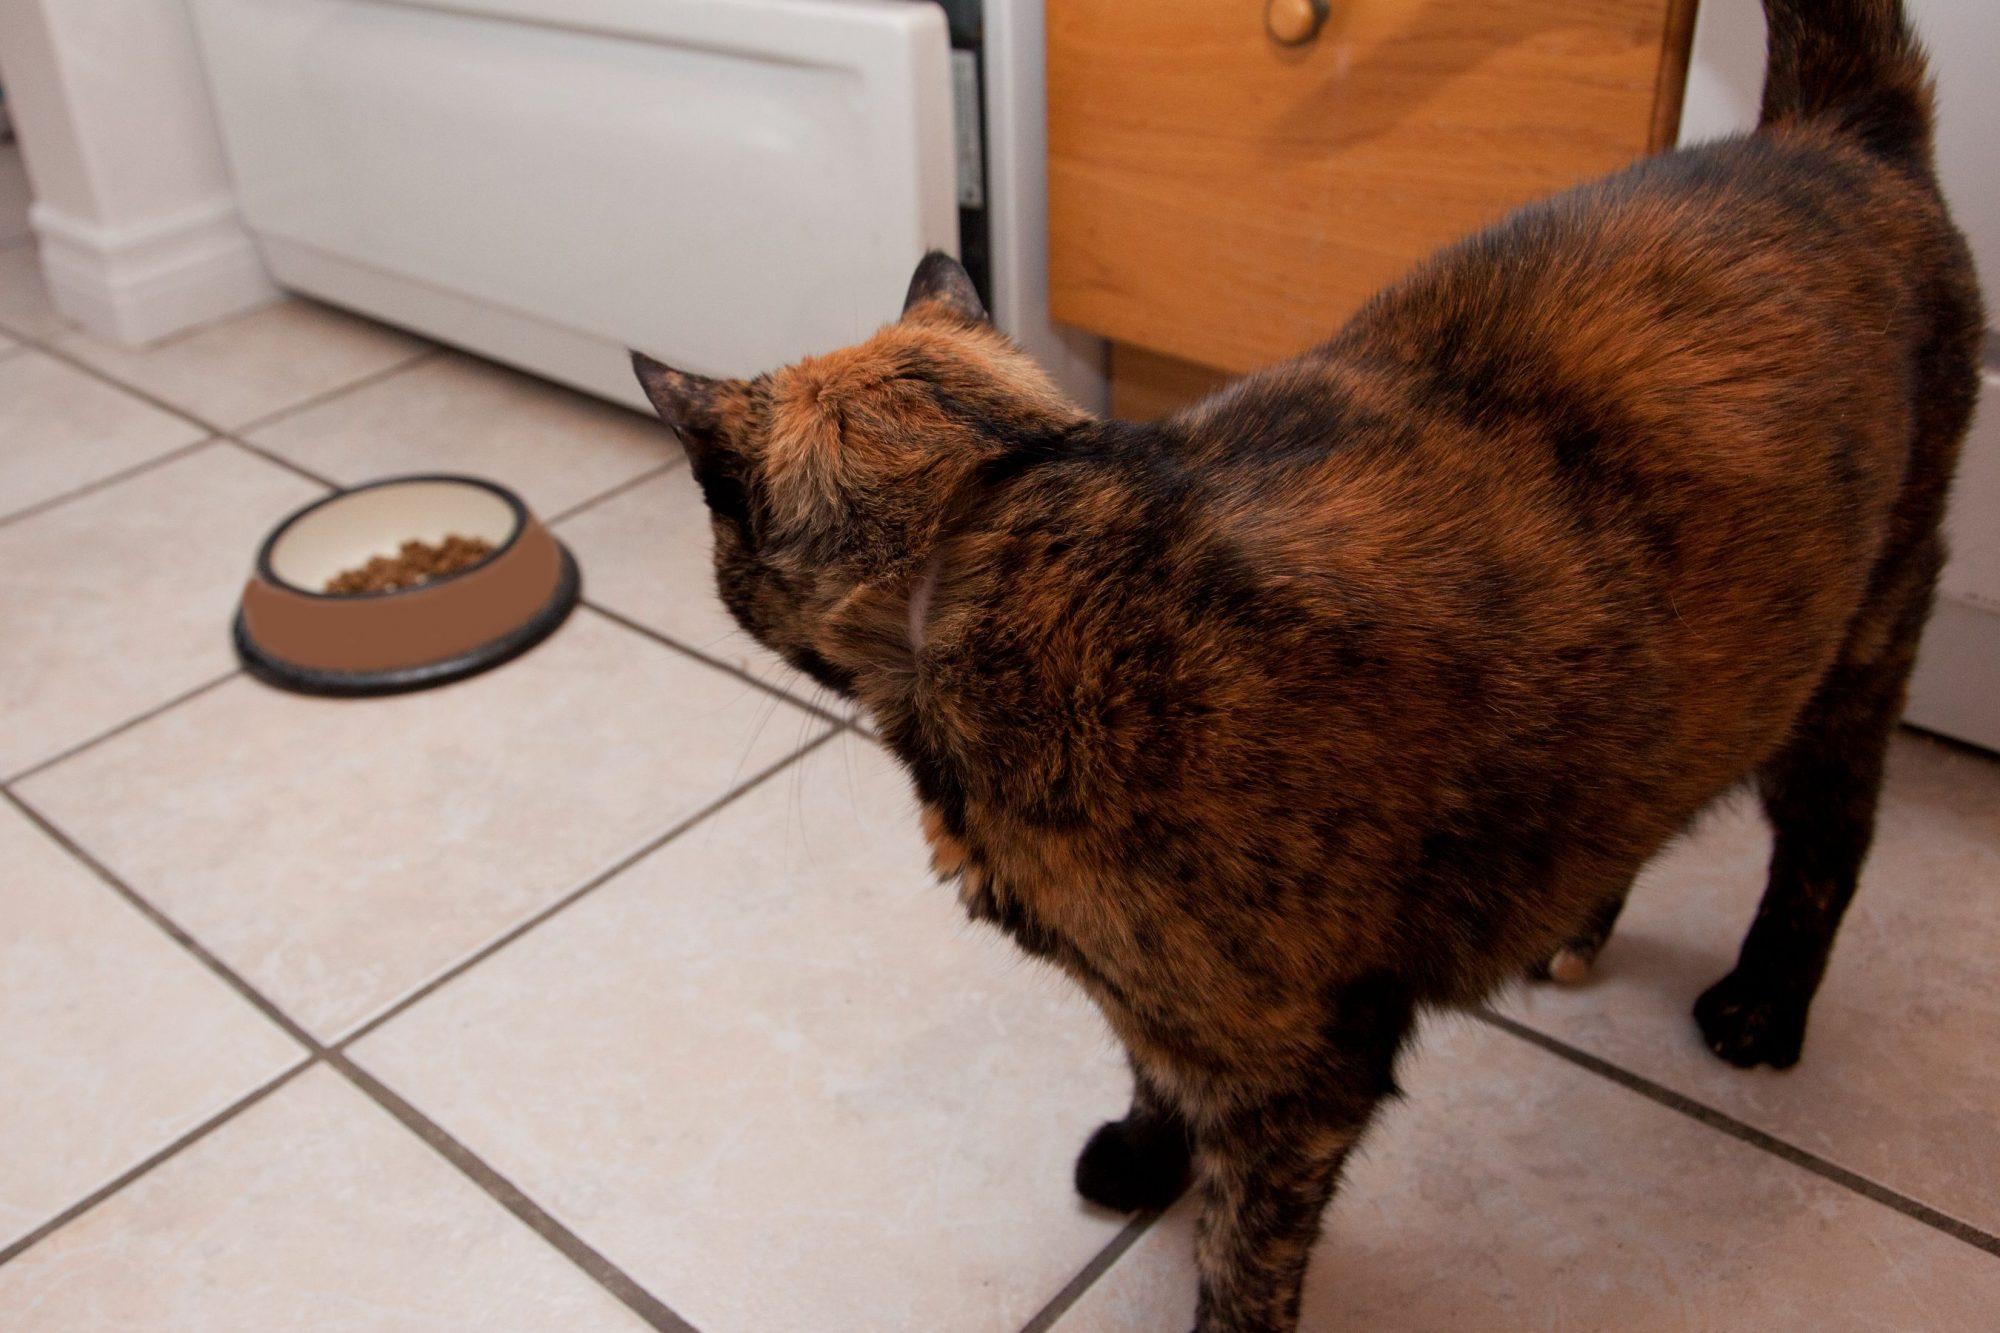 Cat staring at food not eating.